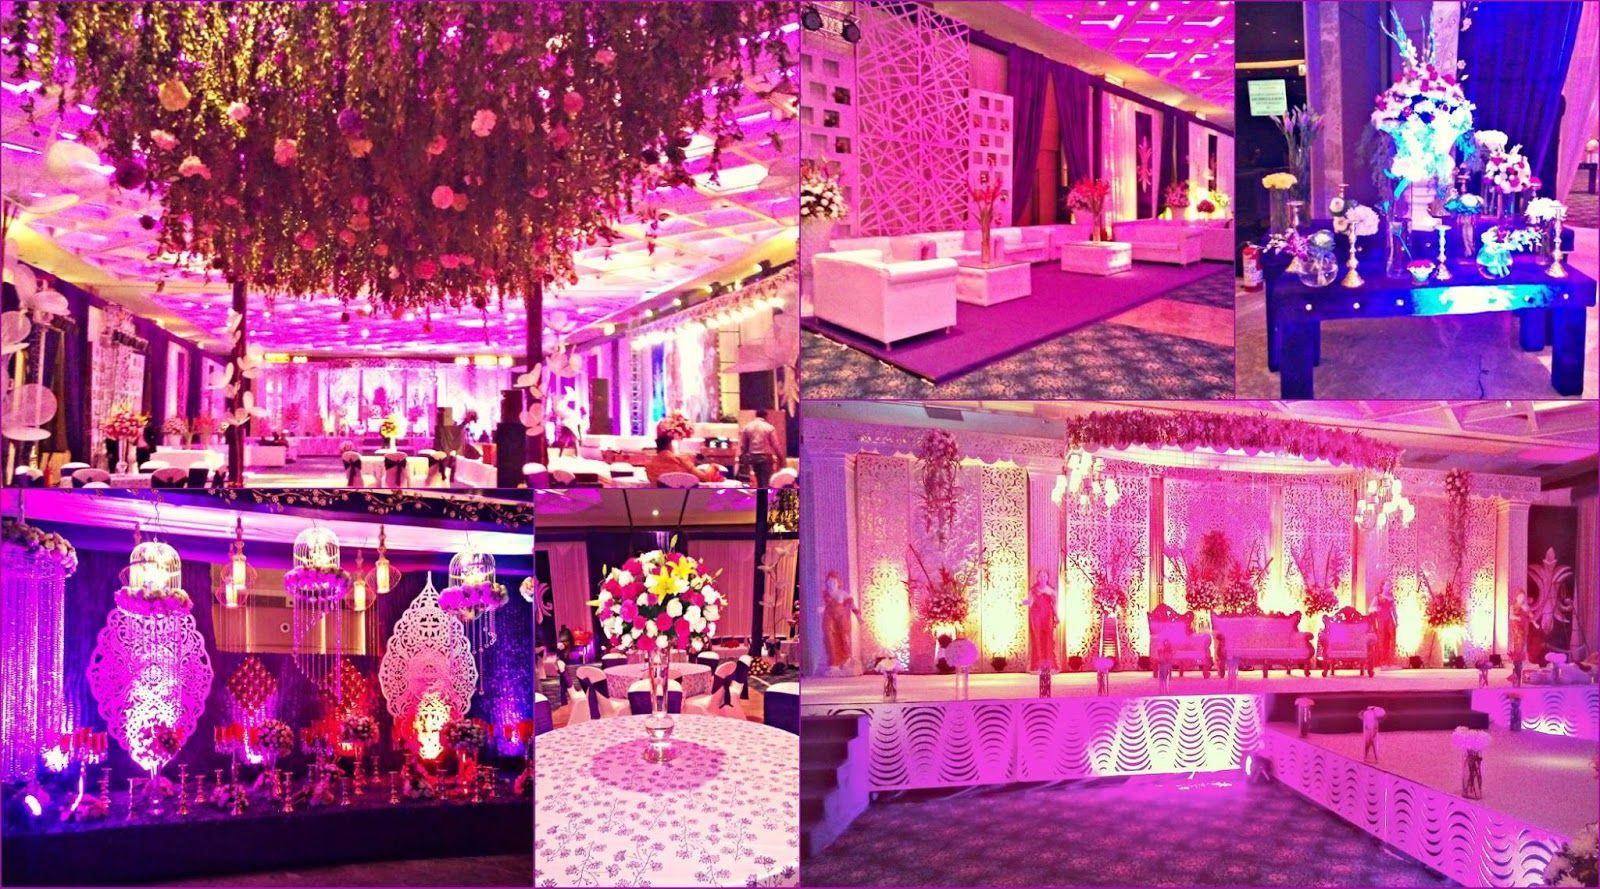 Wedding stage decoration delhi  Perfect Wedding Ideas in Goa u Jodhpur  India WeddingIdeas